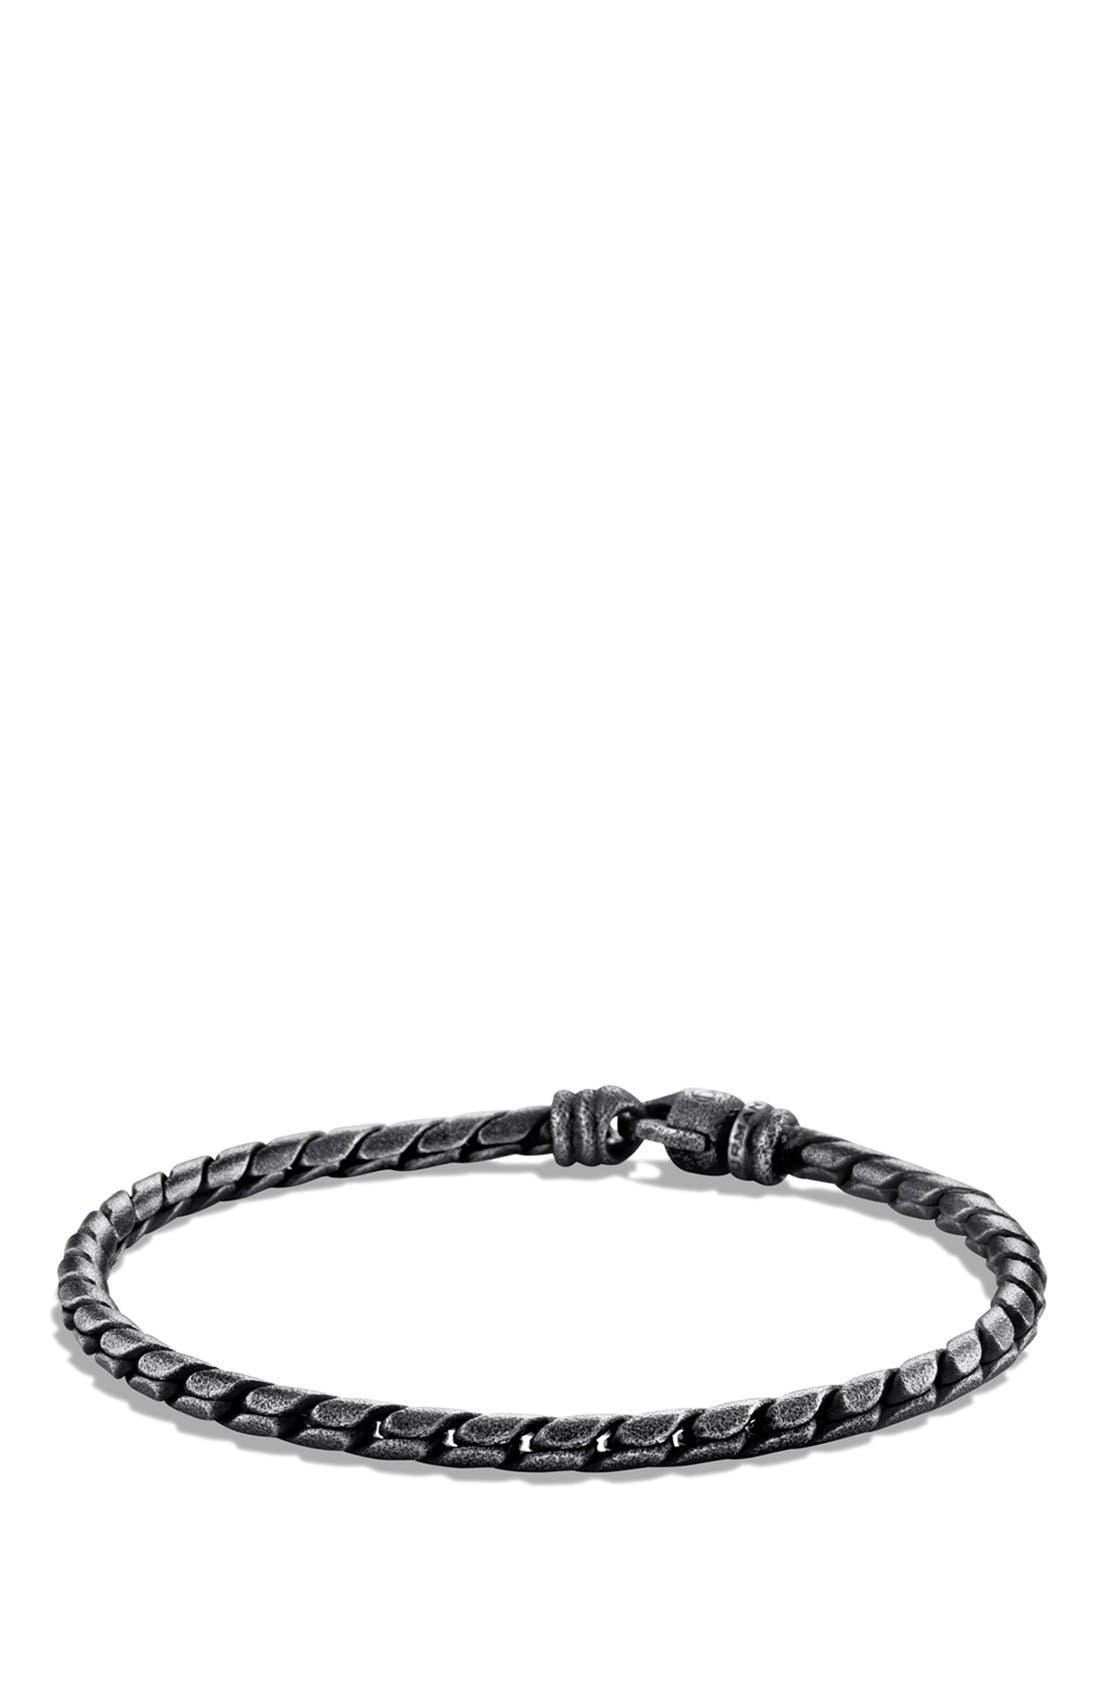 Alternate Image 1 Selected - David Yurman 'Chain' Cobra Chain Bracelet